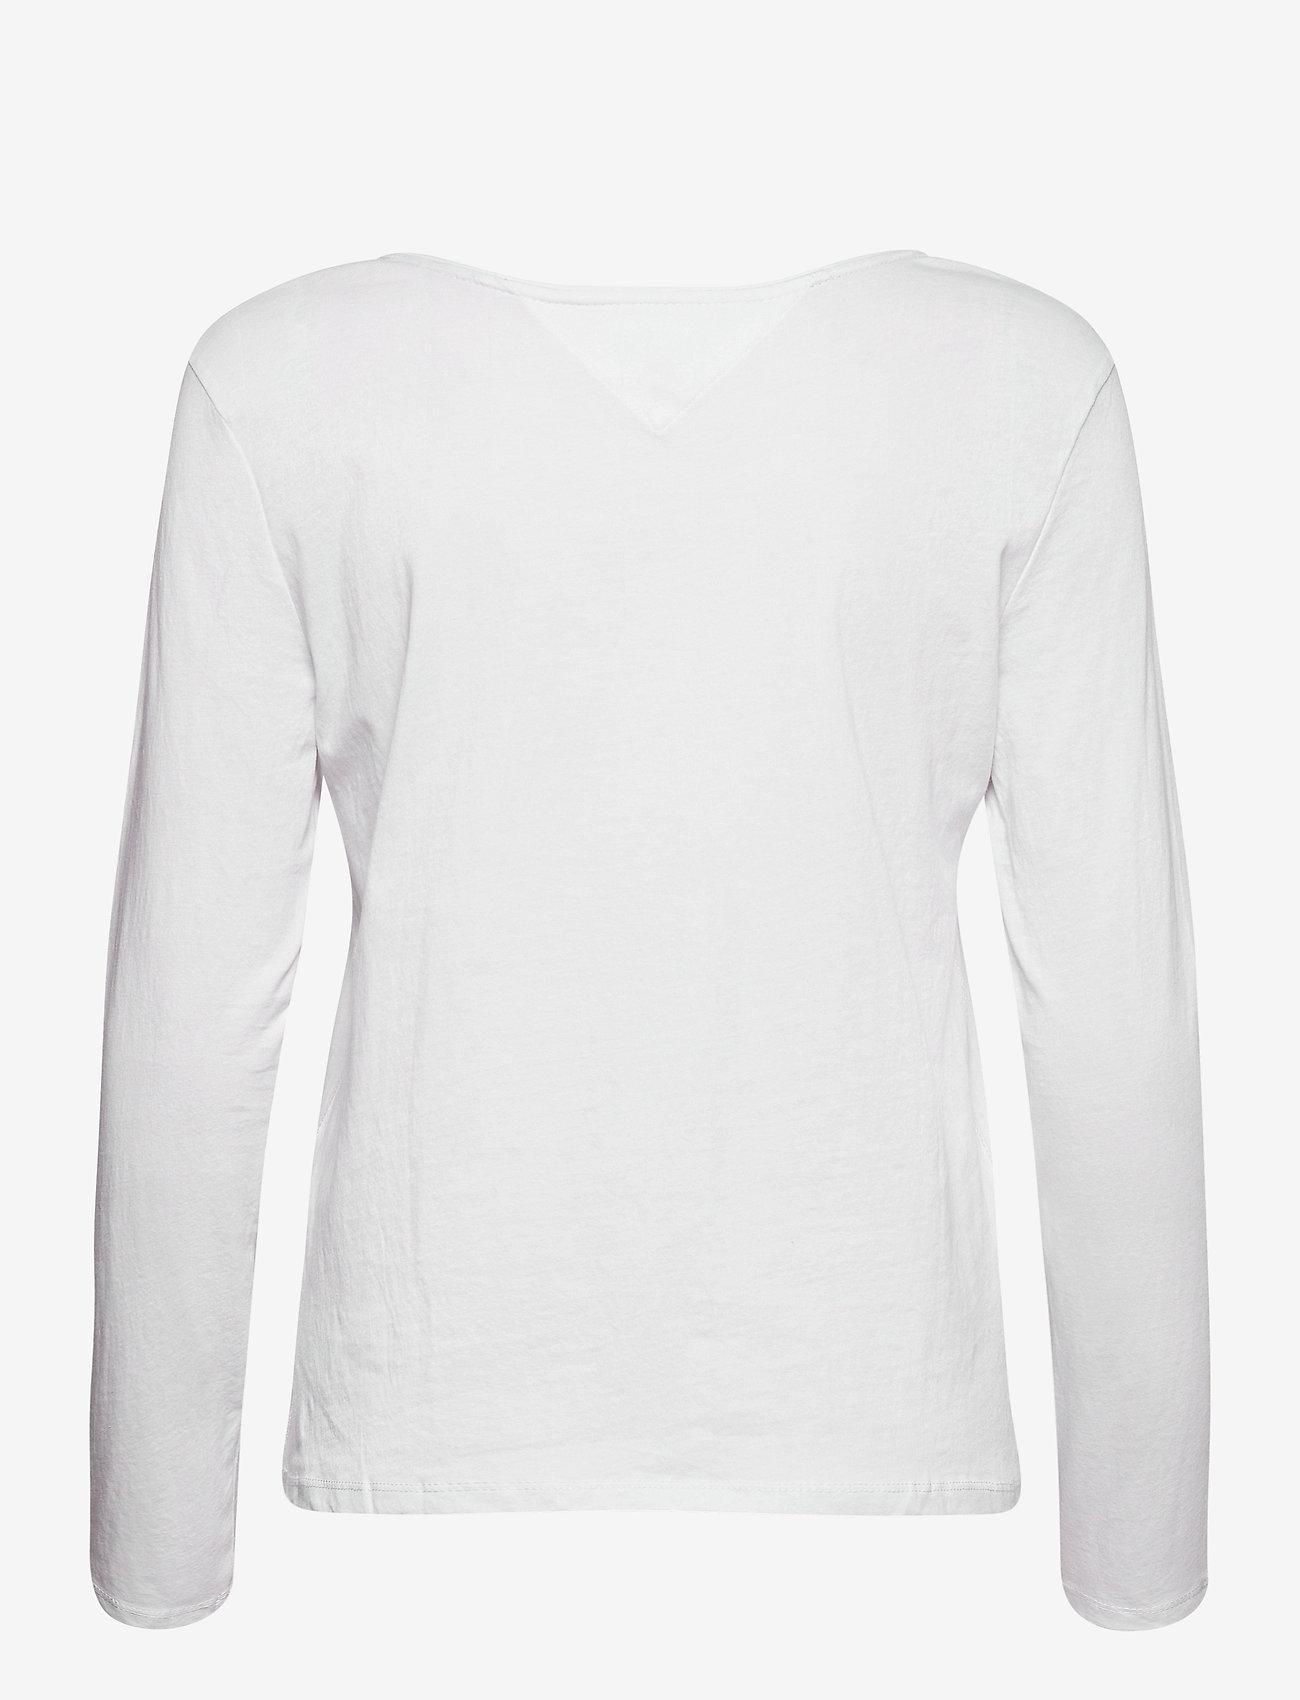 Tommy Jeans - TJW JERSEY V NECK LONGSLEEVE - long-sleeved tops - white - 1